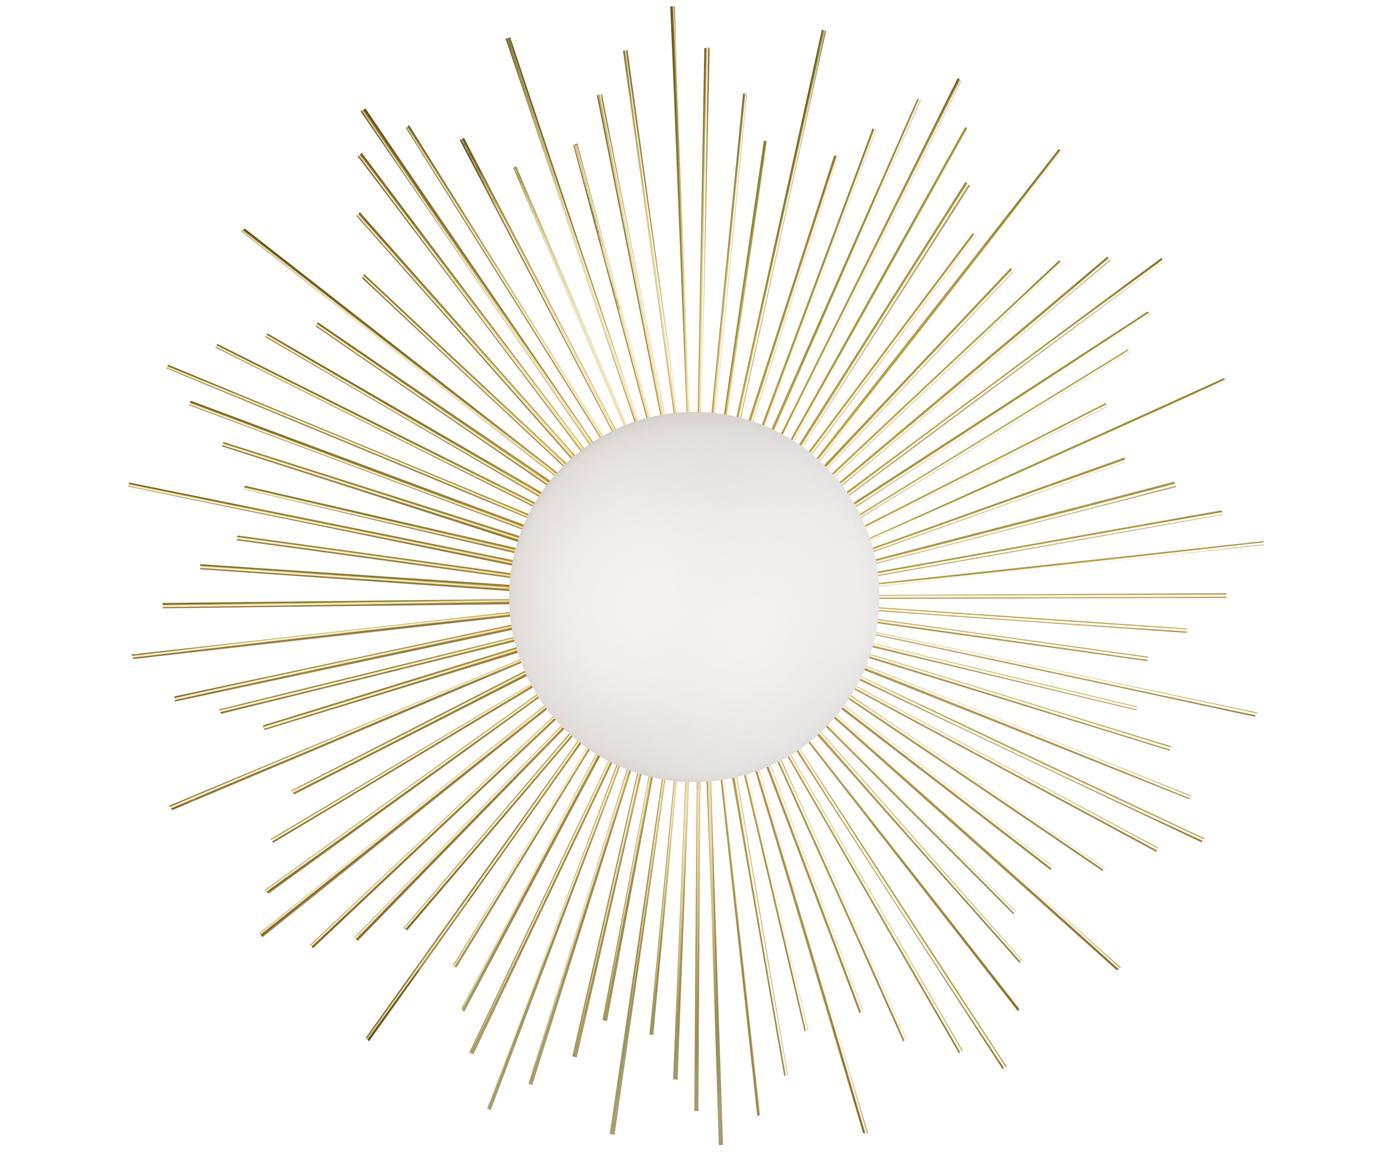 Wandlamp Shimy met stekker, Frame: messing, Lampenkap: glas, Messingkleurig, wit, Ø 56 x D 11 cm